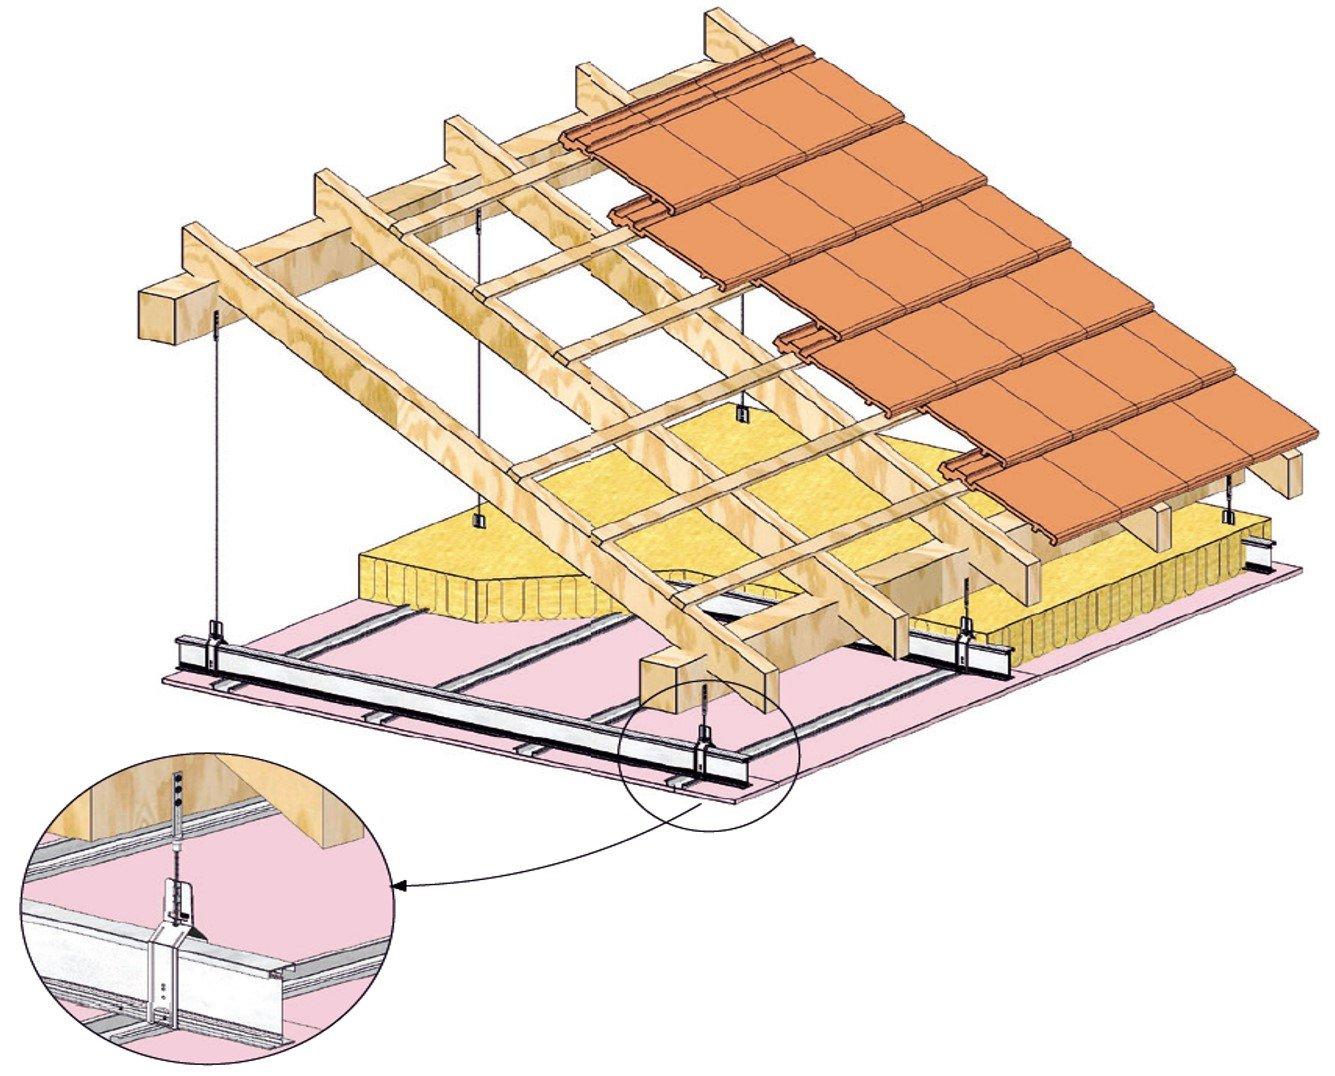 Plafond knauf m tal 2 kf13 plafonds pl tre knauf m tal for Plafond ba13 sur ossature metallique